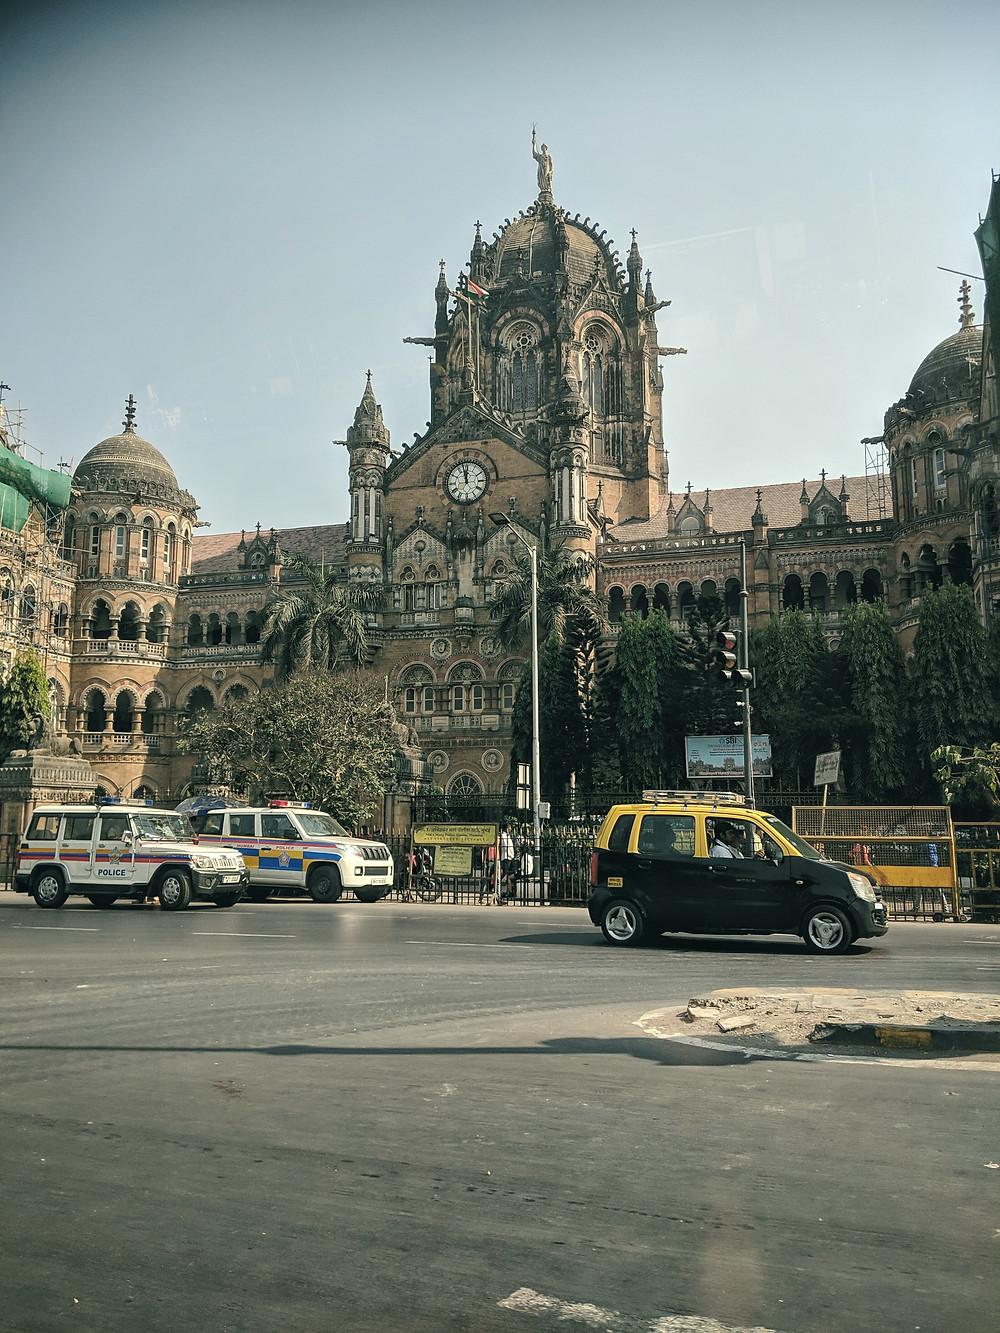 chatrapati shivaji terminal Mumbai India